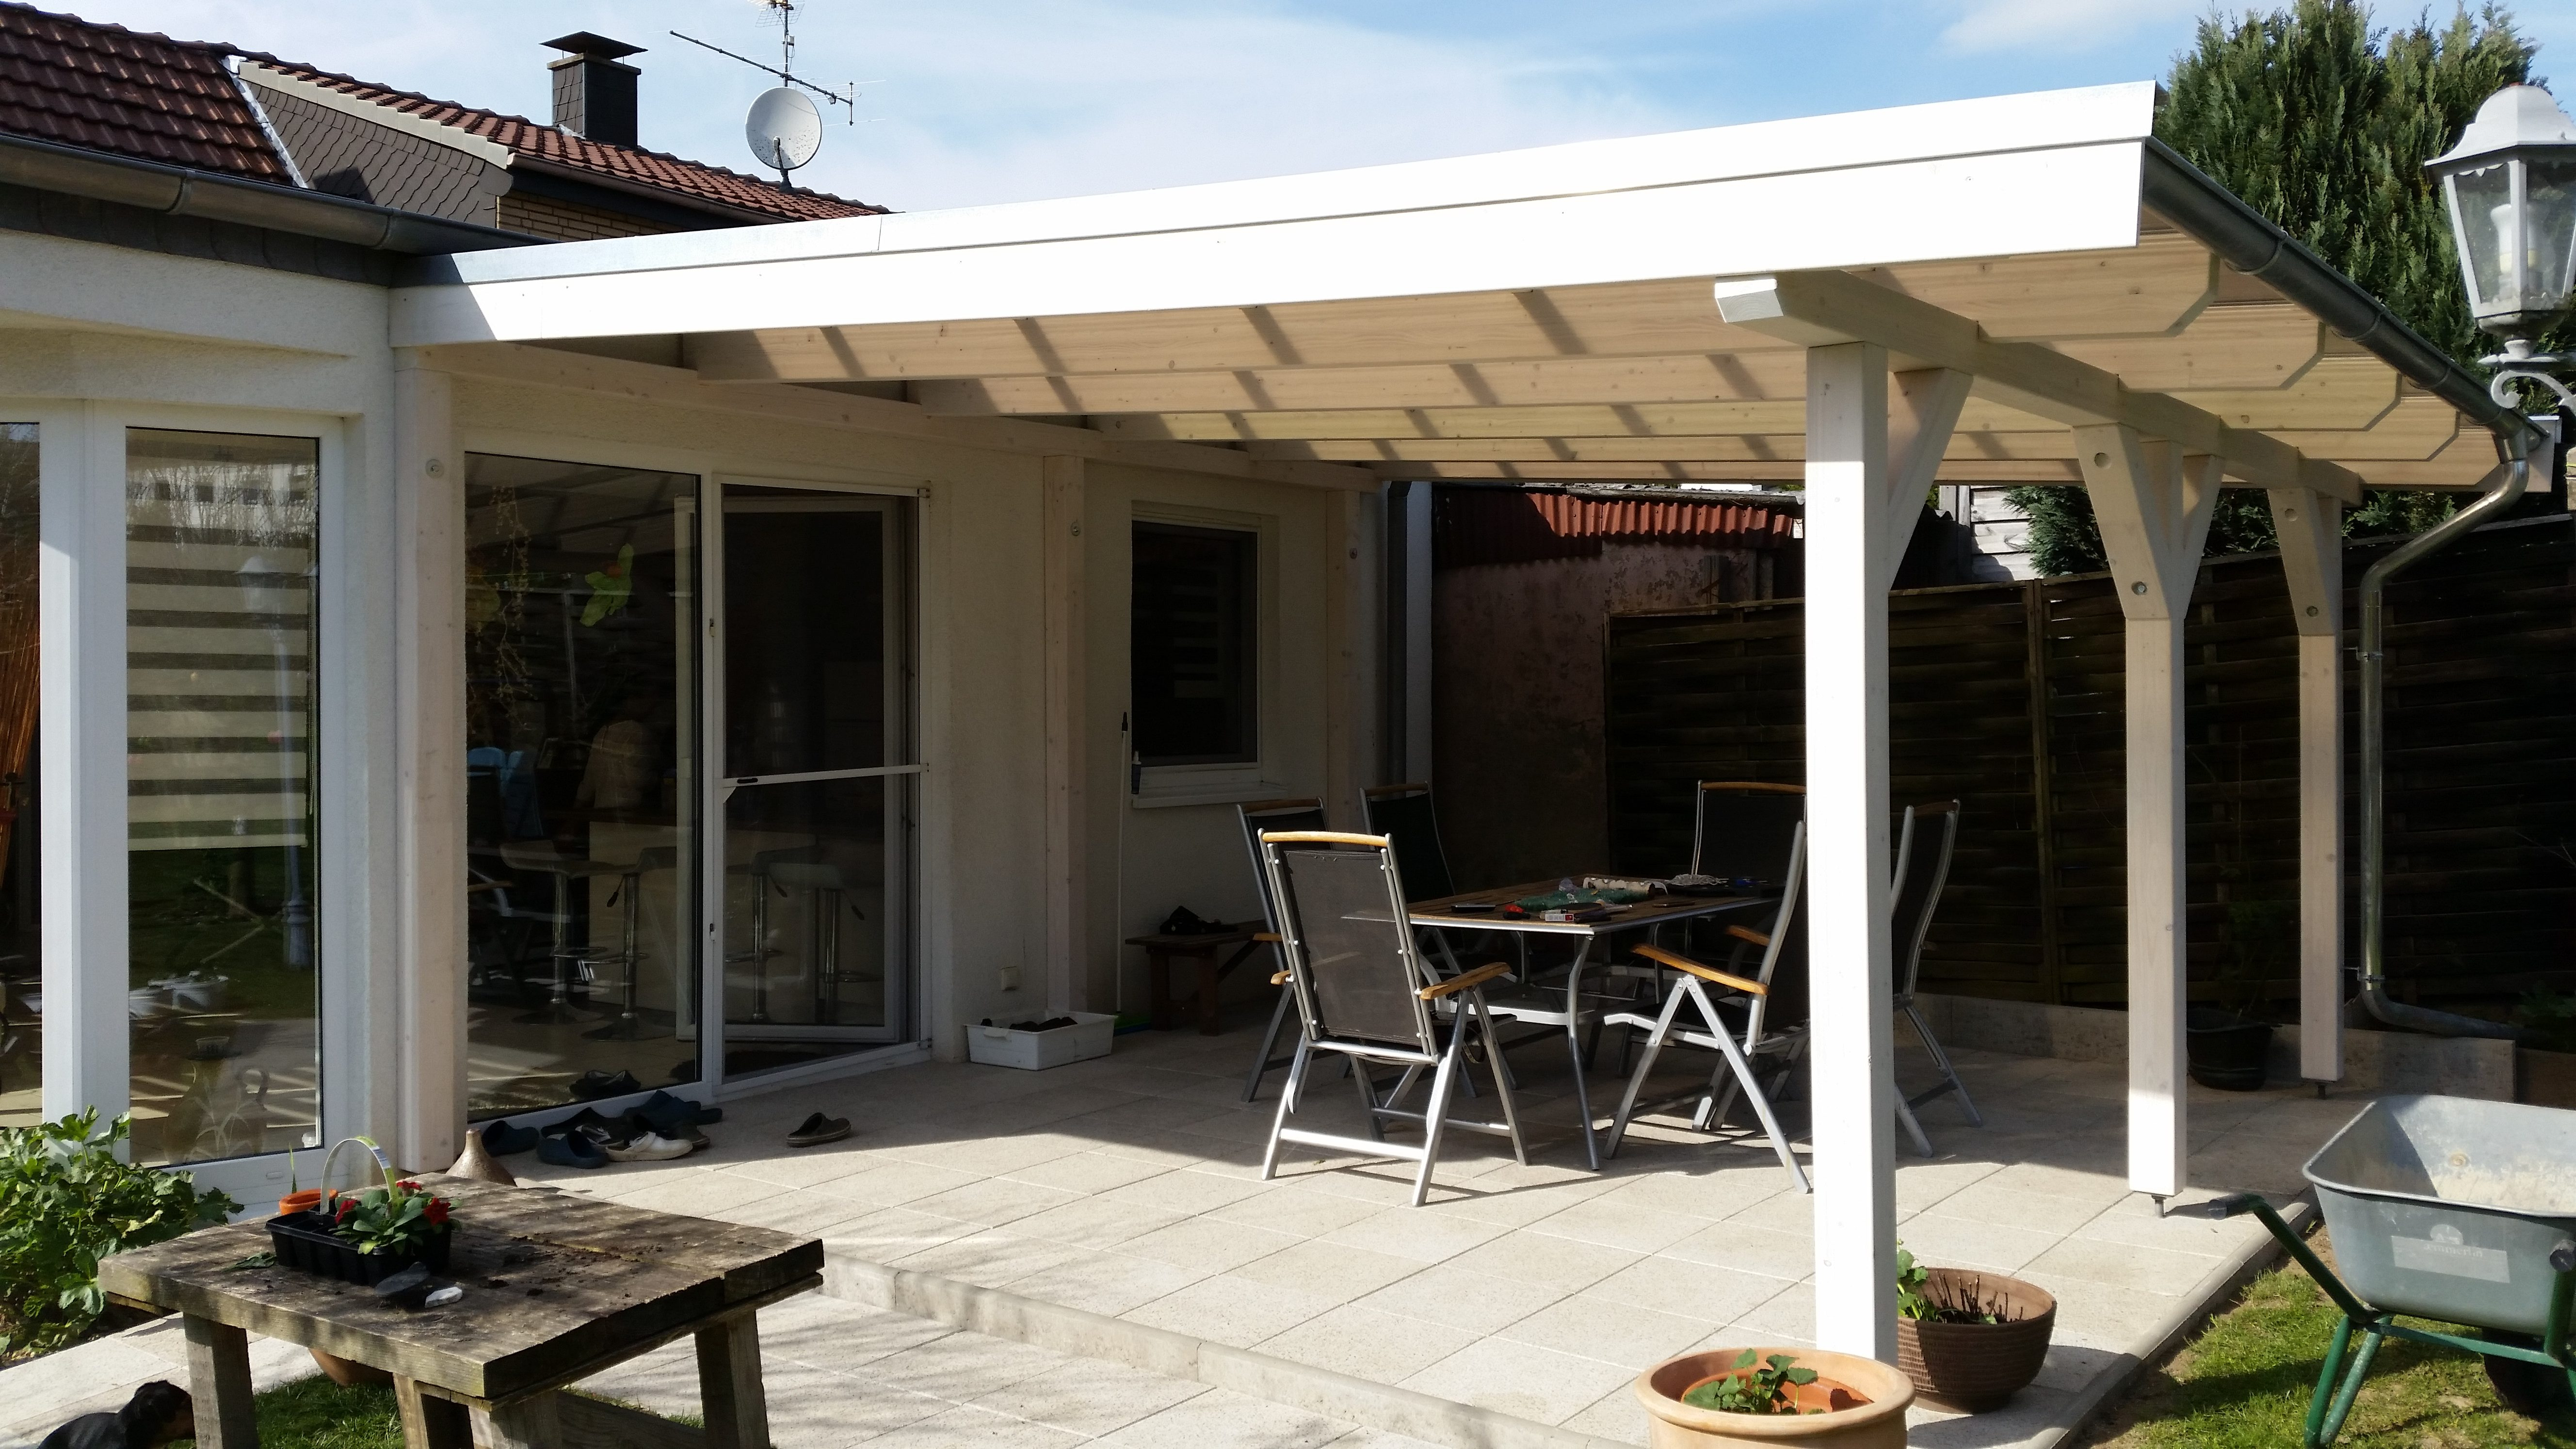 Terrassenüberdachung, Holz, Verbundglas